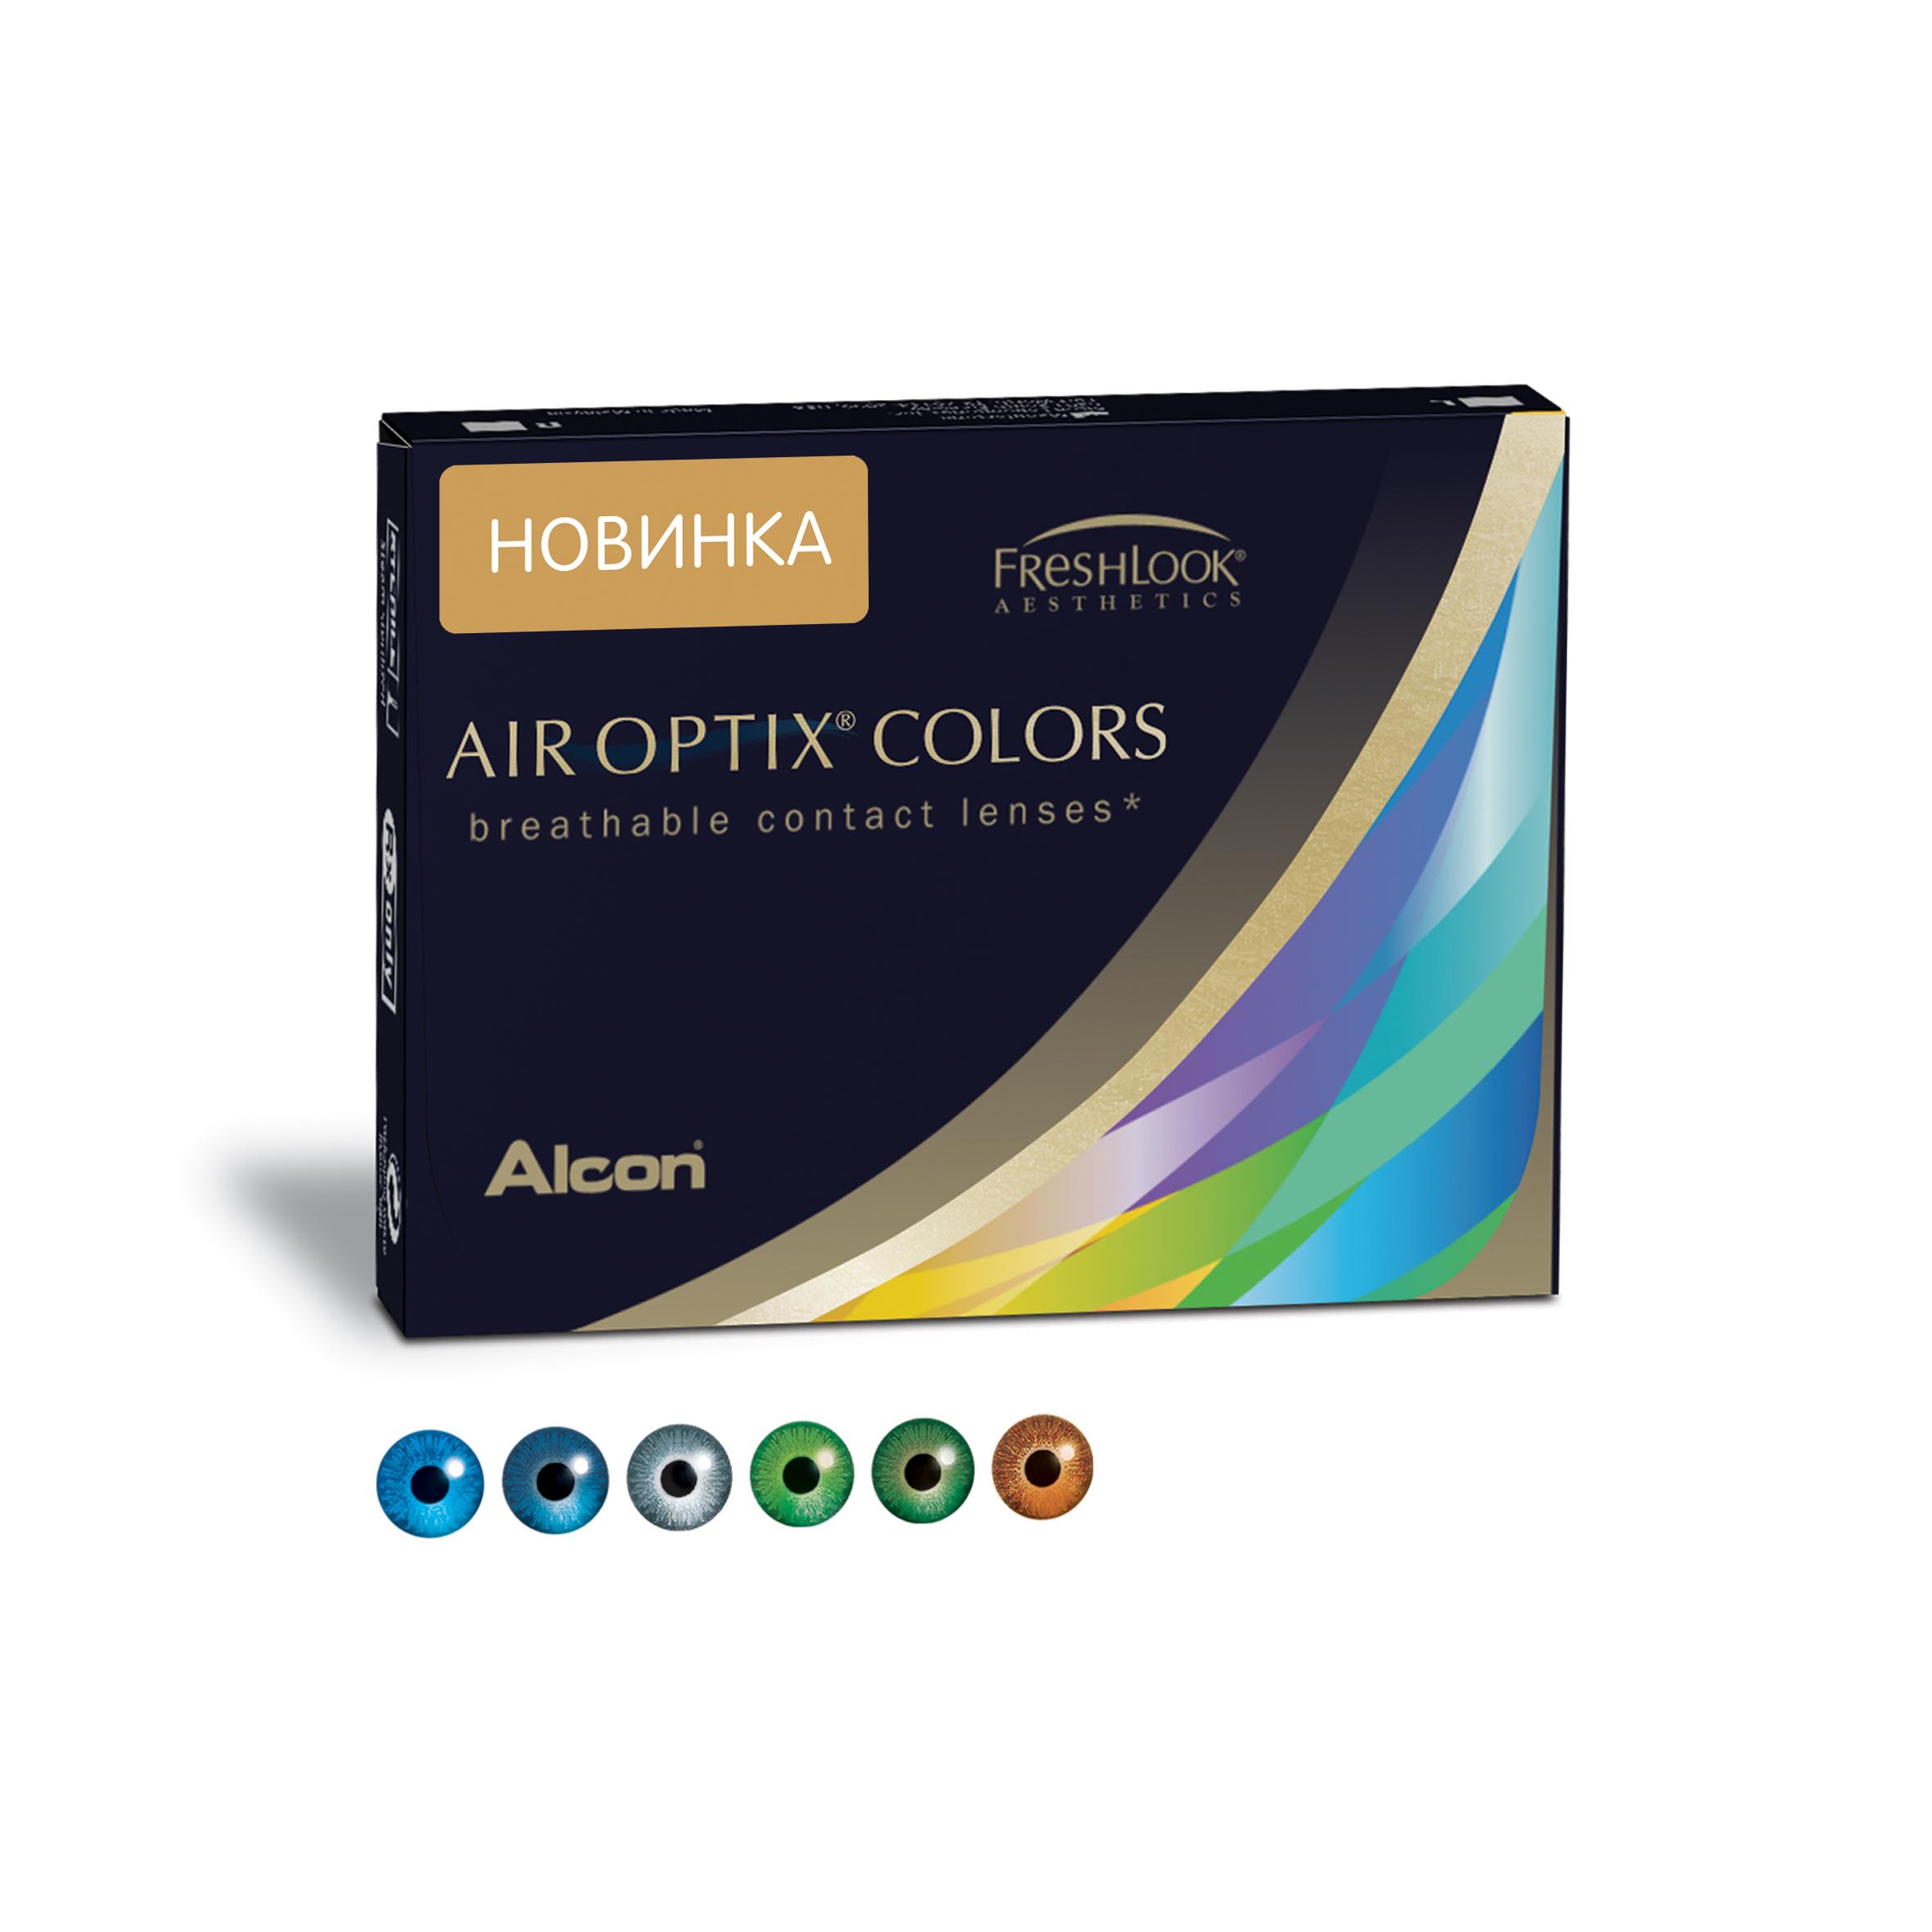 Аlcon контактные линзы Air Optix Colors 2 шт -1.75 Green31746153Мягкие контактные линзы